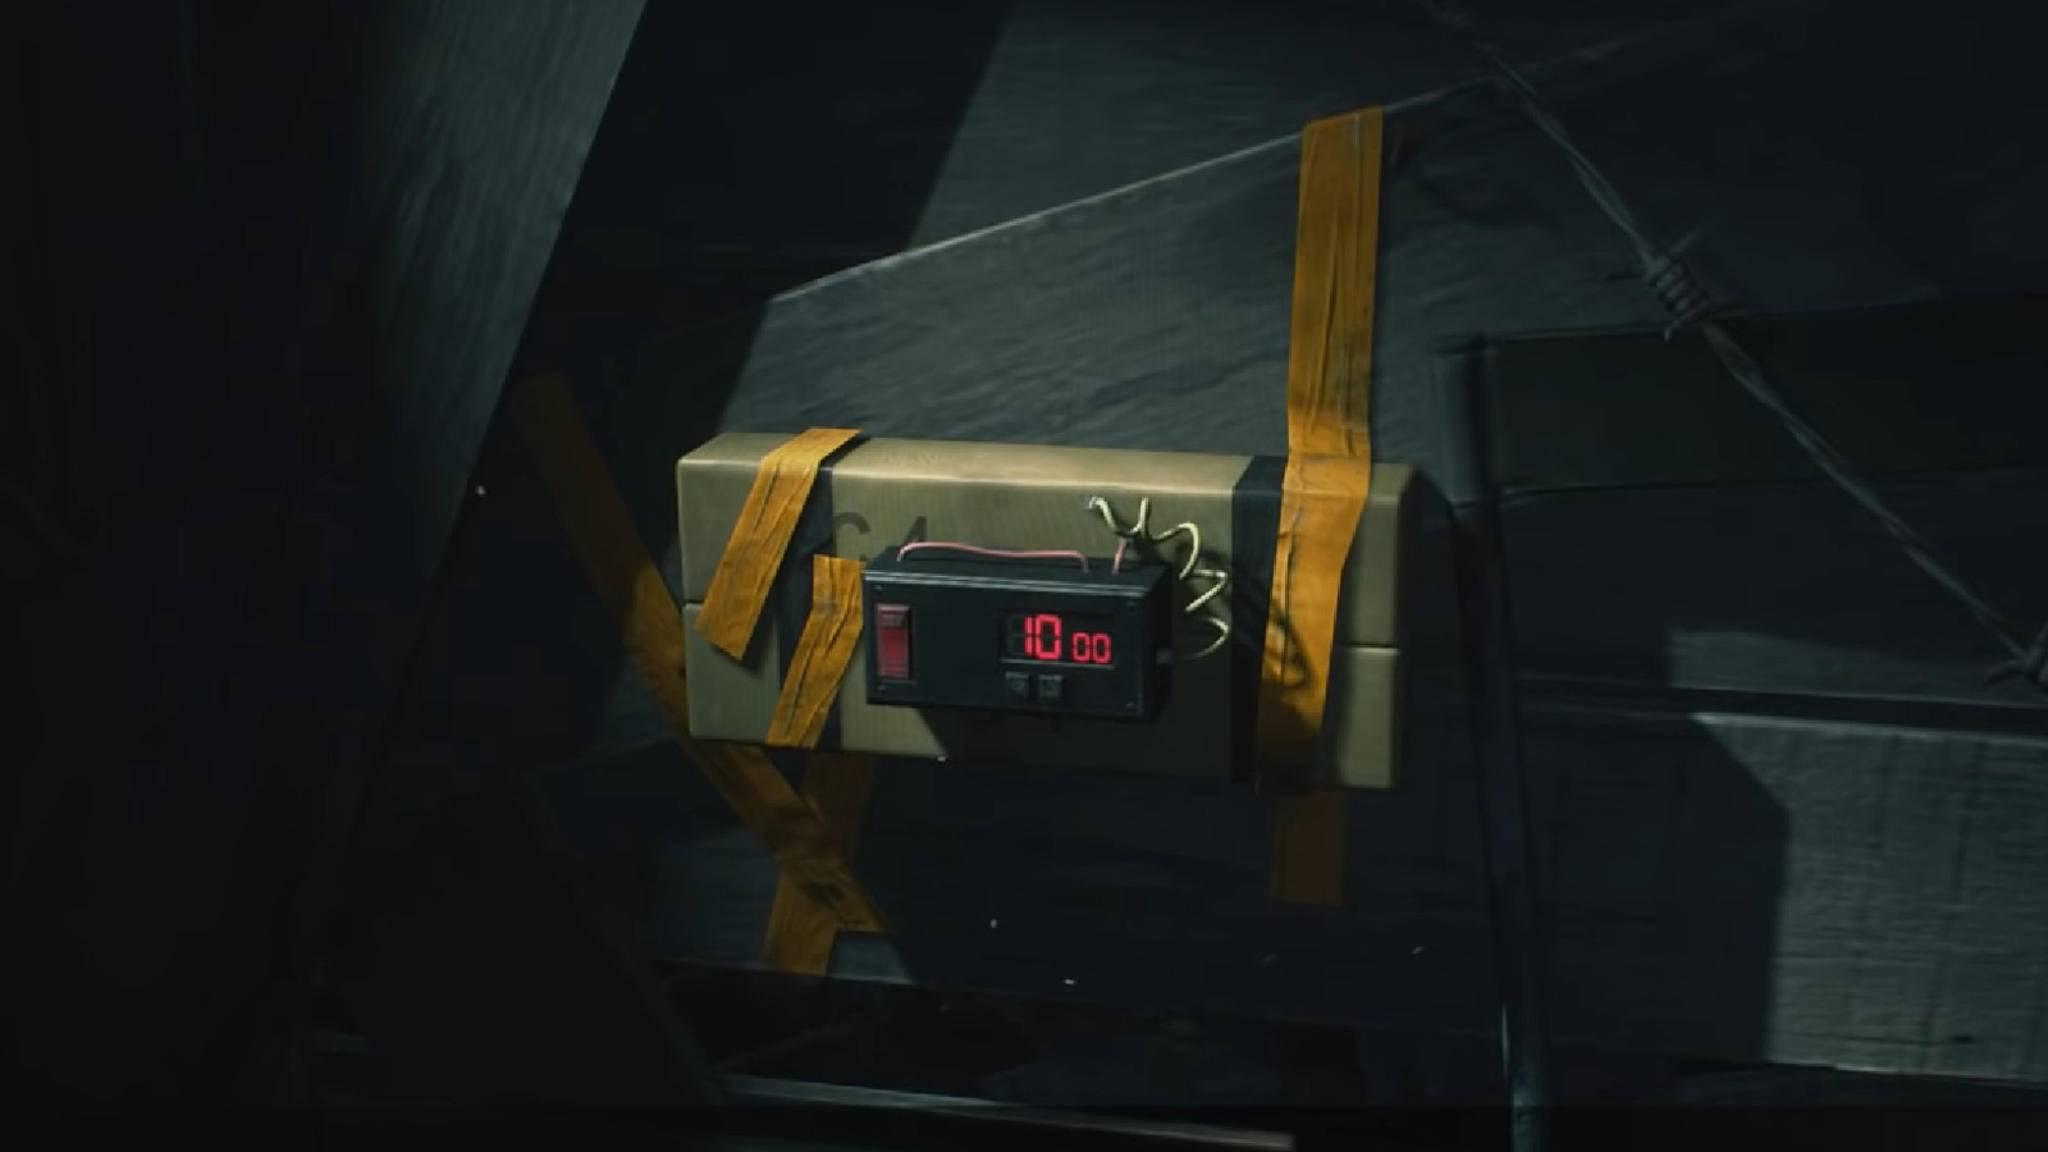 Läuft der Timer an der C4-Ladung schon? Nicht? Dann folge unserem Ratgeber!